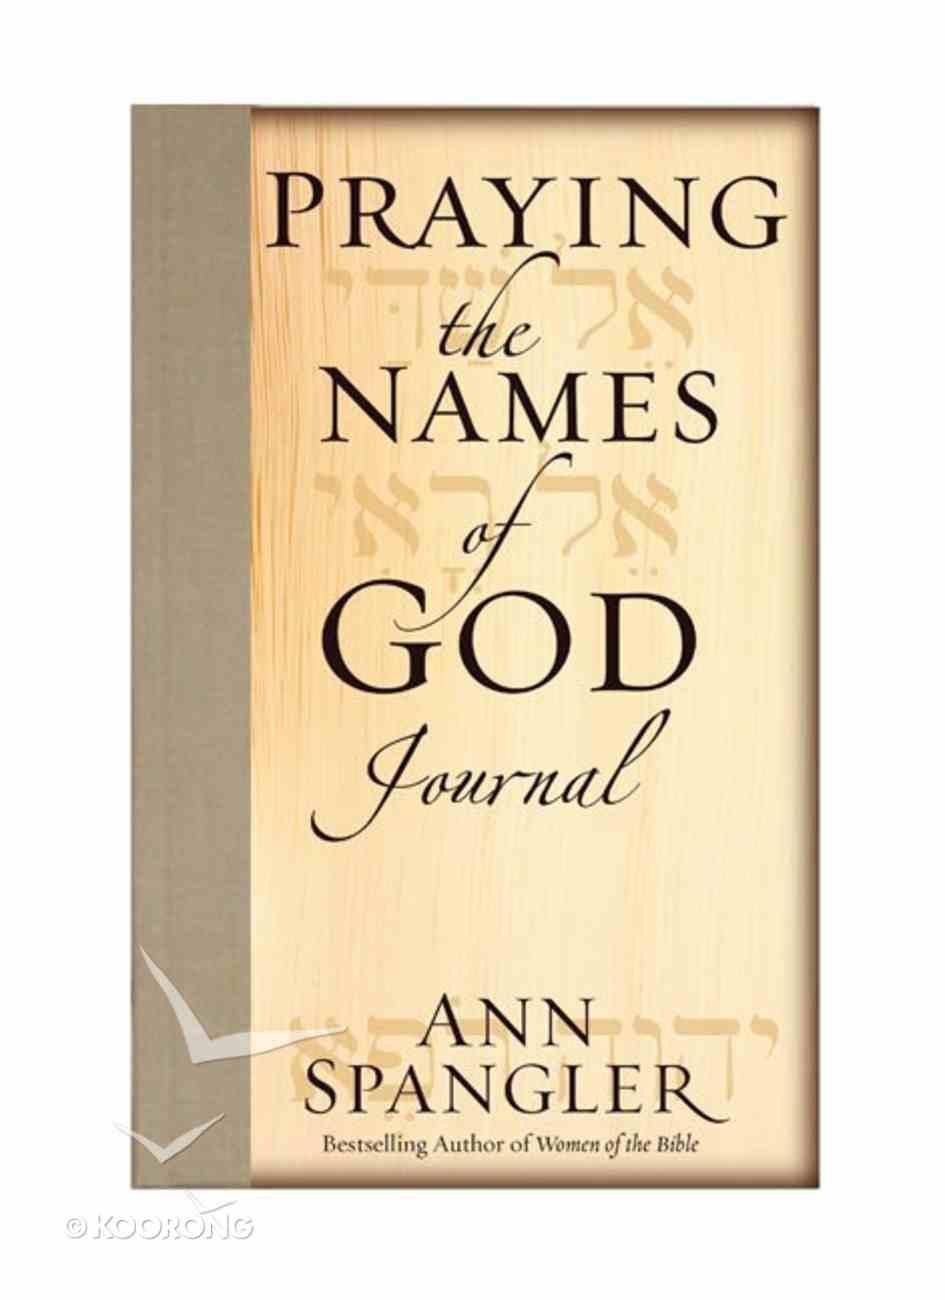 Praying the Names of God (Journal) Hardback